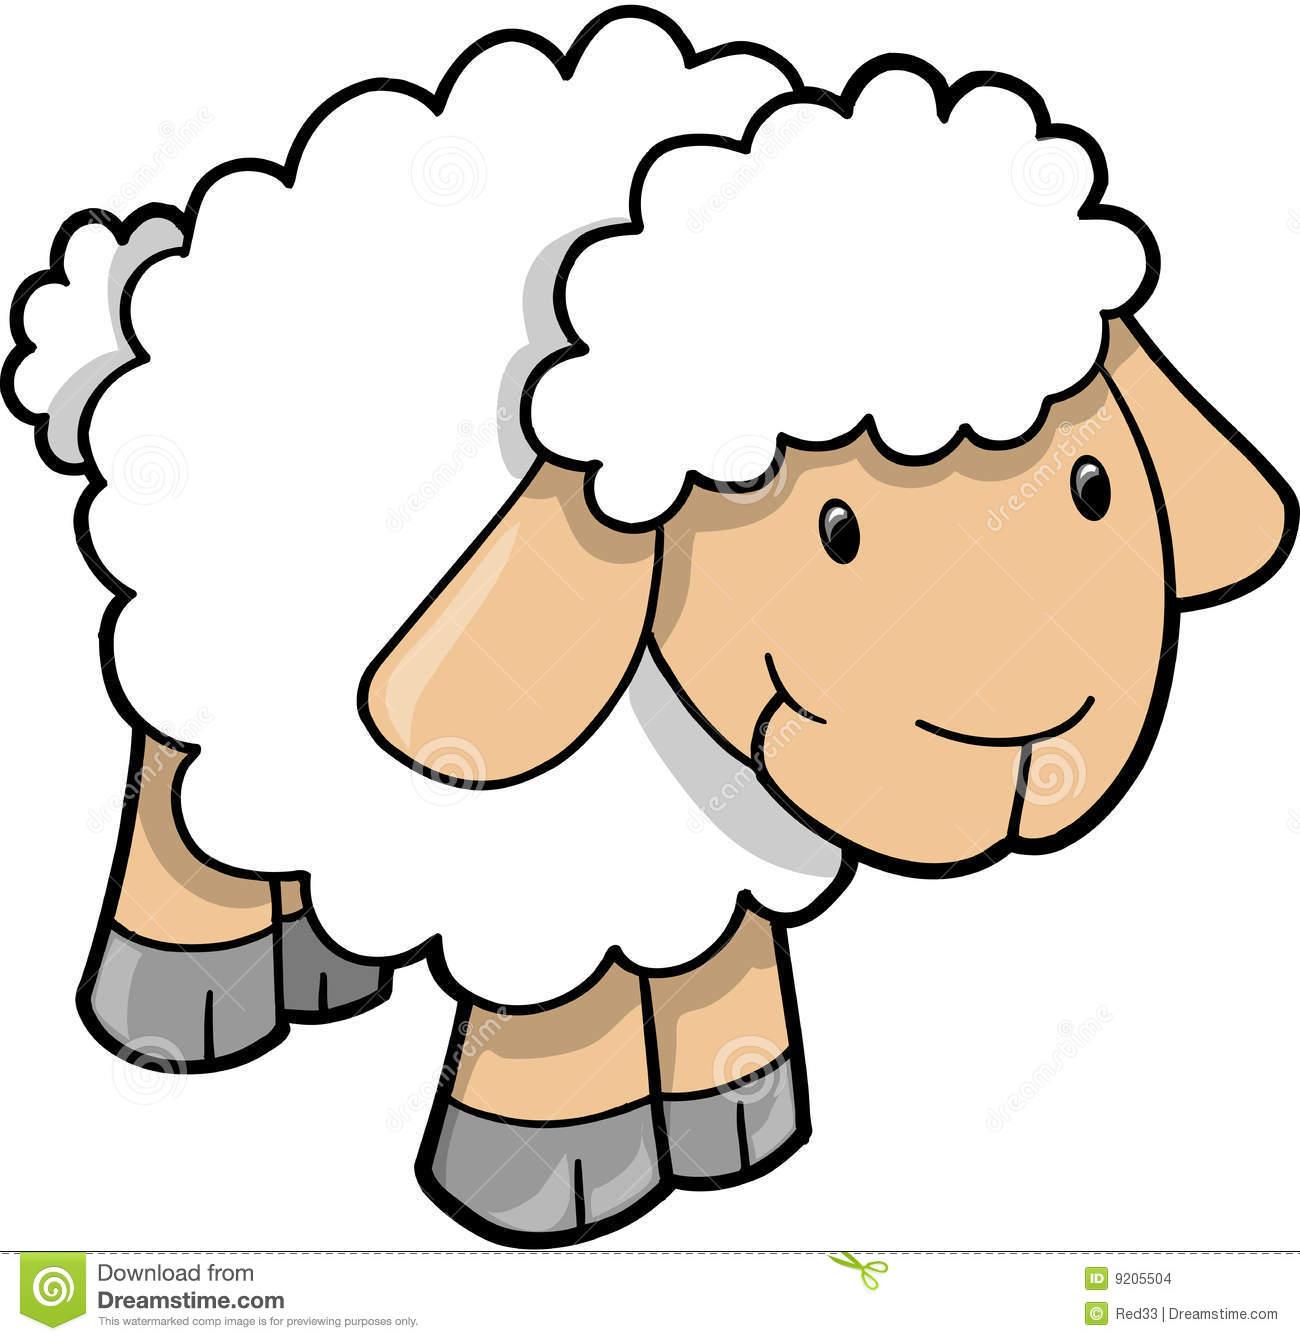 Lamb Clip Art Clipart Panda Free Clipart-Lamb Clip Art Clipart Panda Free Clipart Images-0